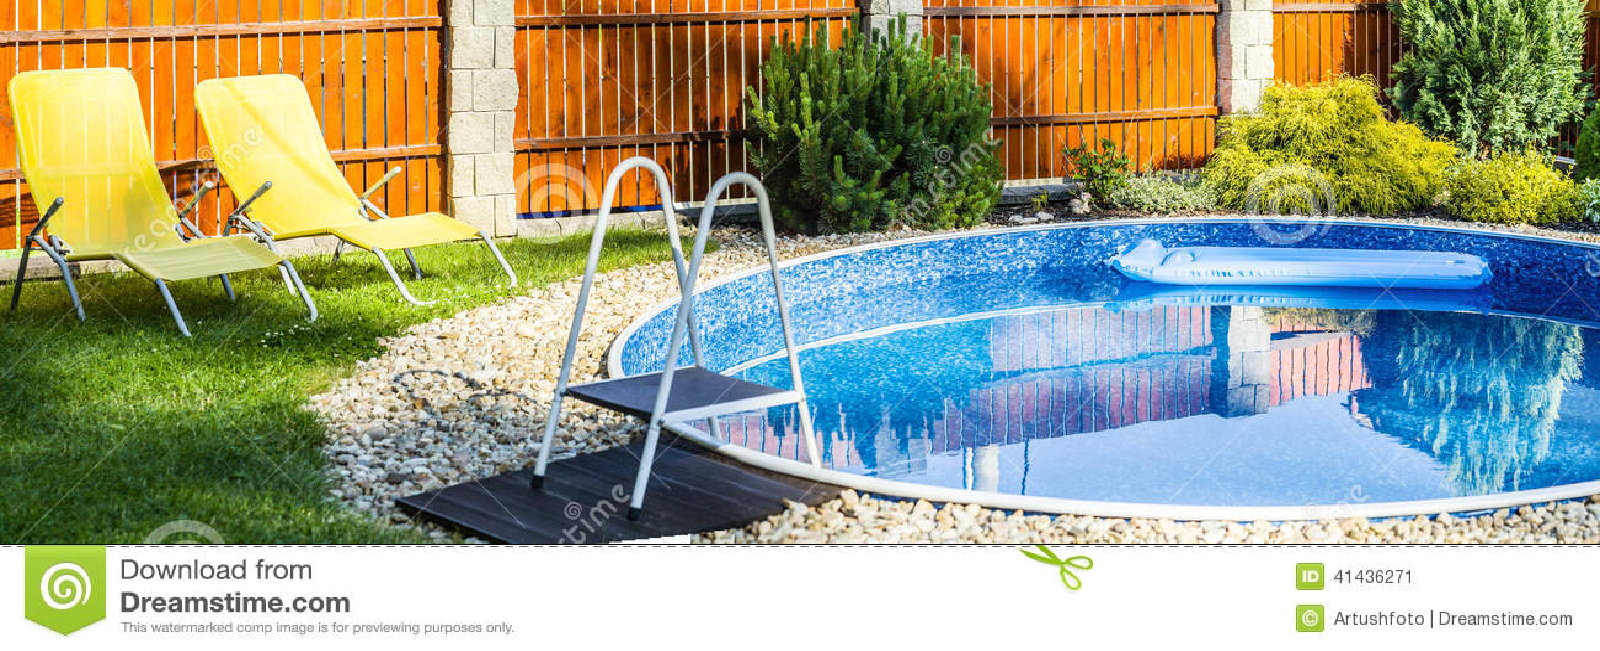 Panorama de la peque a piscina casera foto de archivo for Piscinas caseras